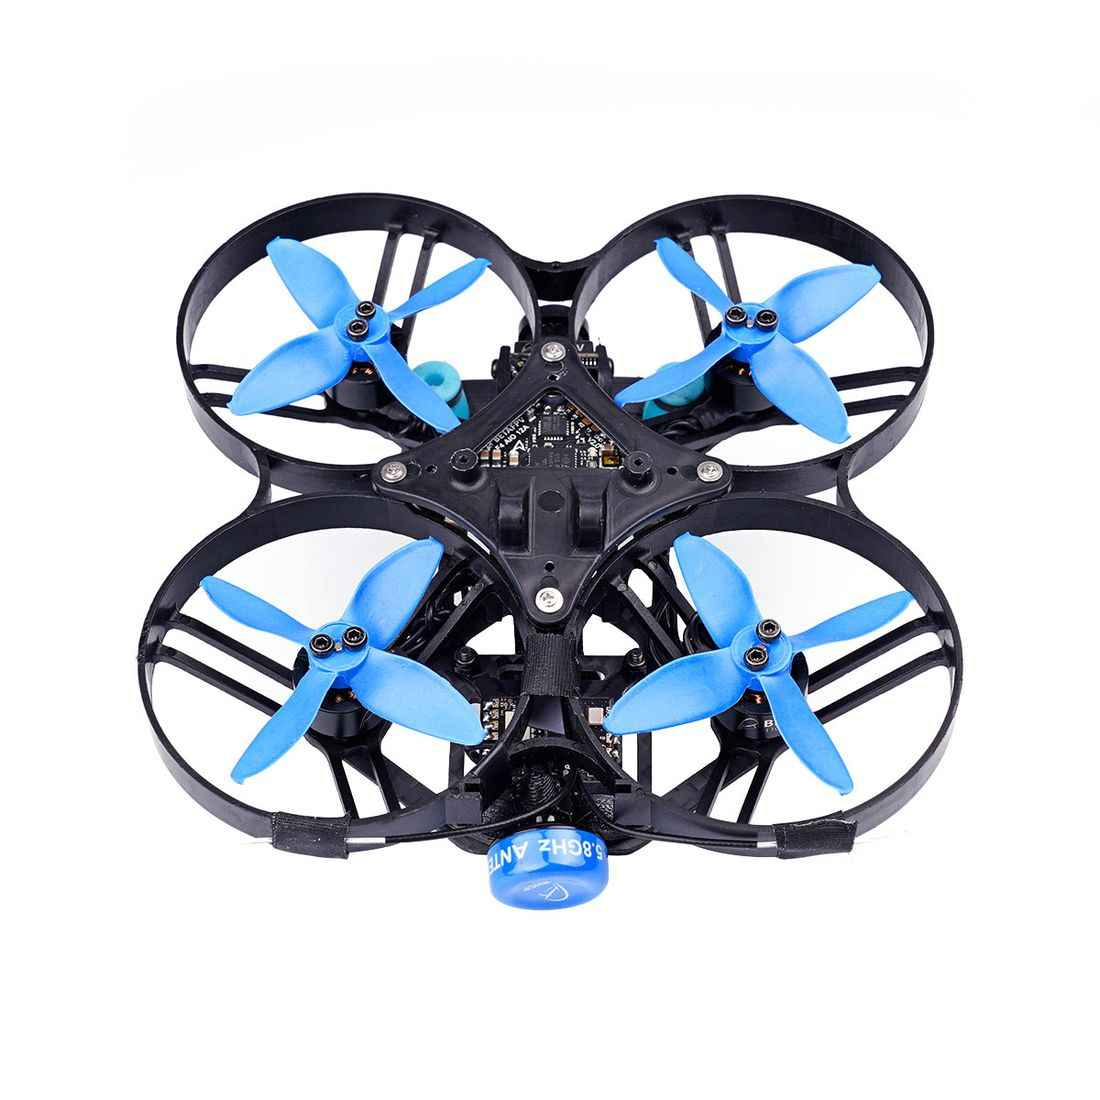 BETAFPV 4pcs 1105 5000KV Brushless Motors Customized for Beta85X 2-4S FPV Racing Drone Micro Quadcopter Cine Whoop